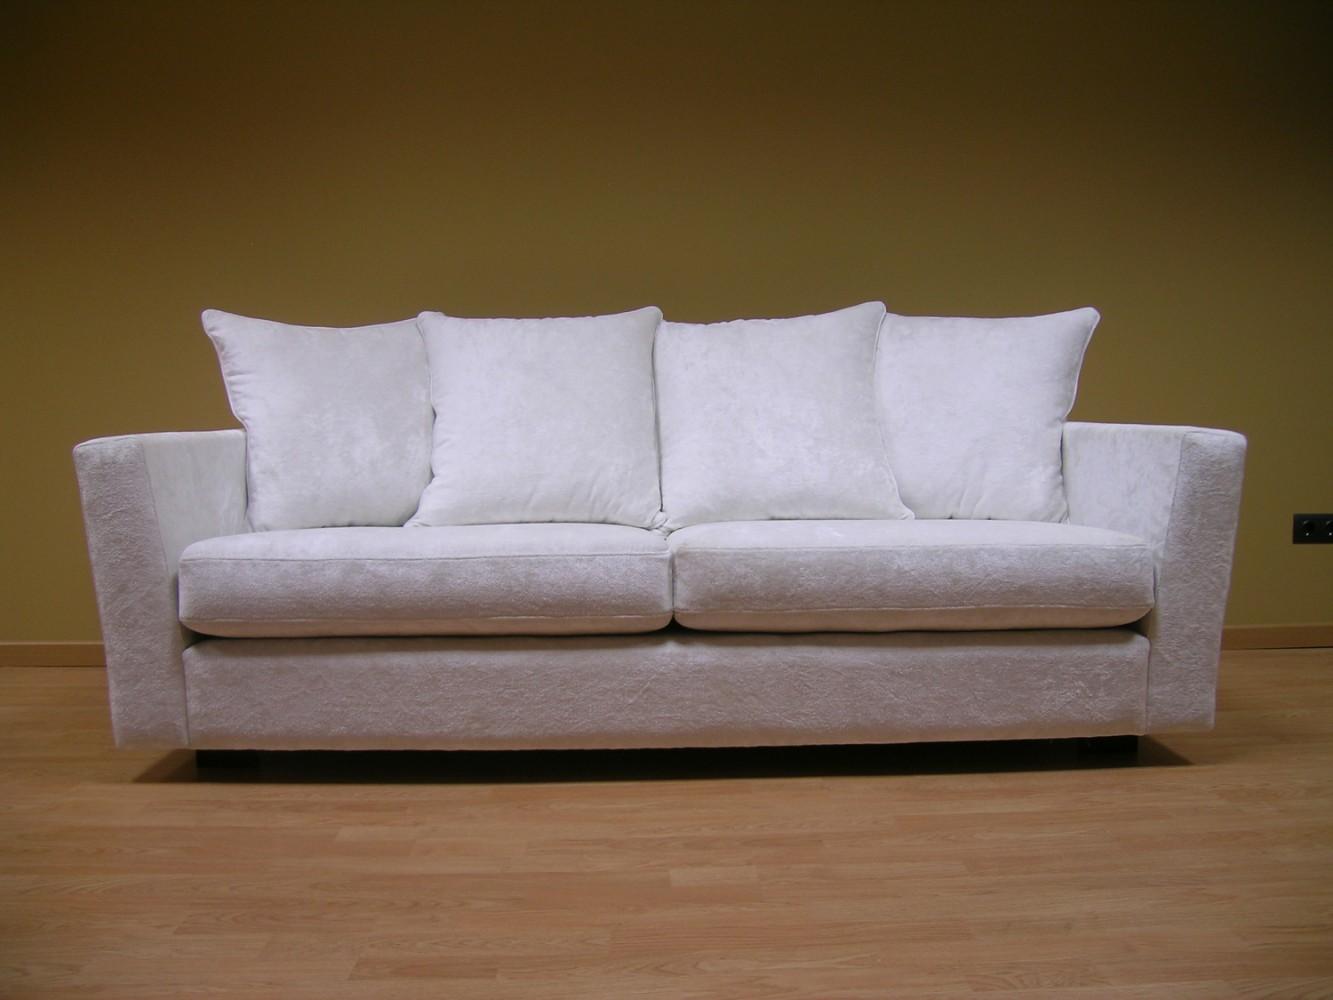 sofas valencia espana bed sofa ikea usa montduver sofÁs seval fábrica de sofás en